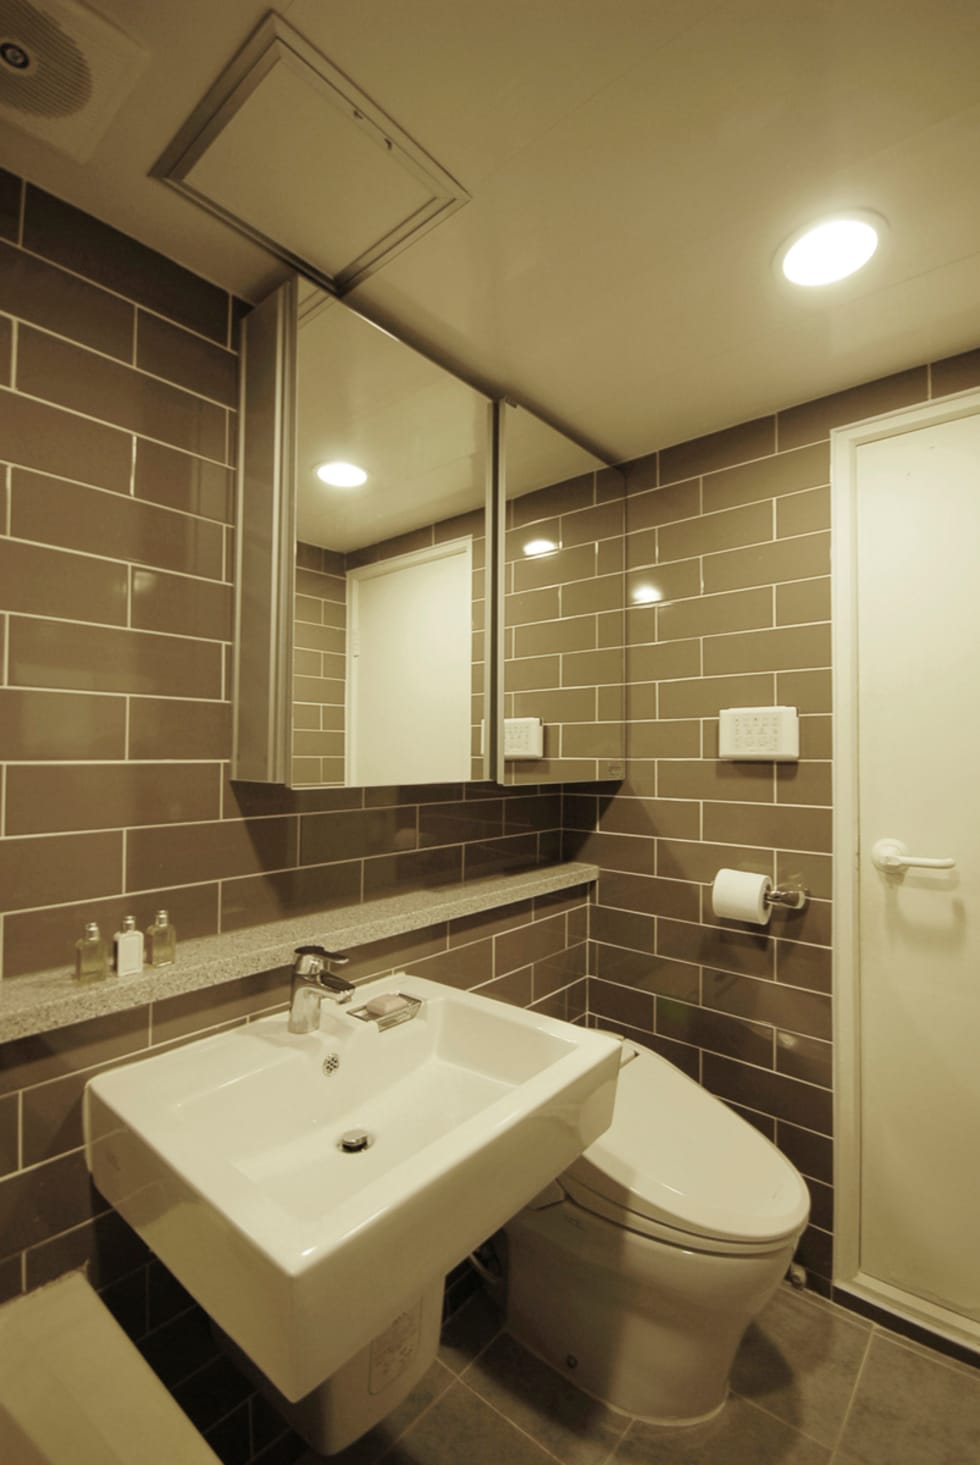 C Apartment (63sqm.): By Seog Be Seog | 바이석비석의  화장실